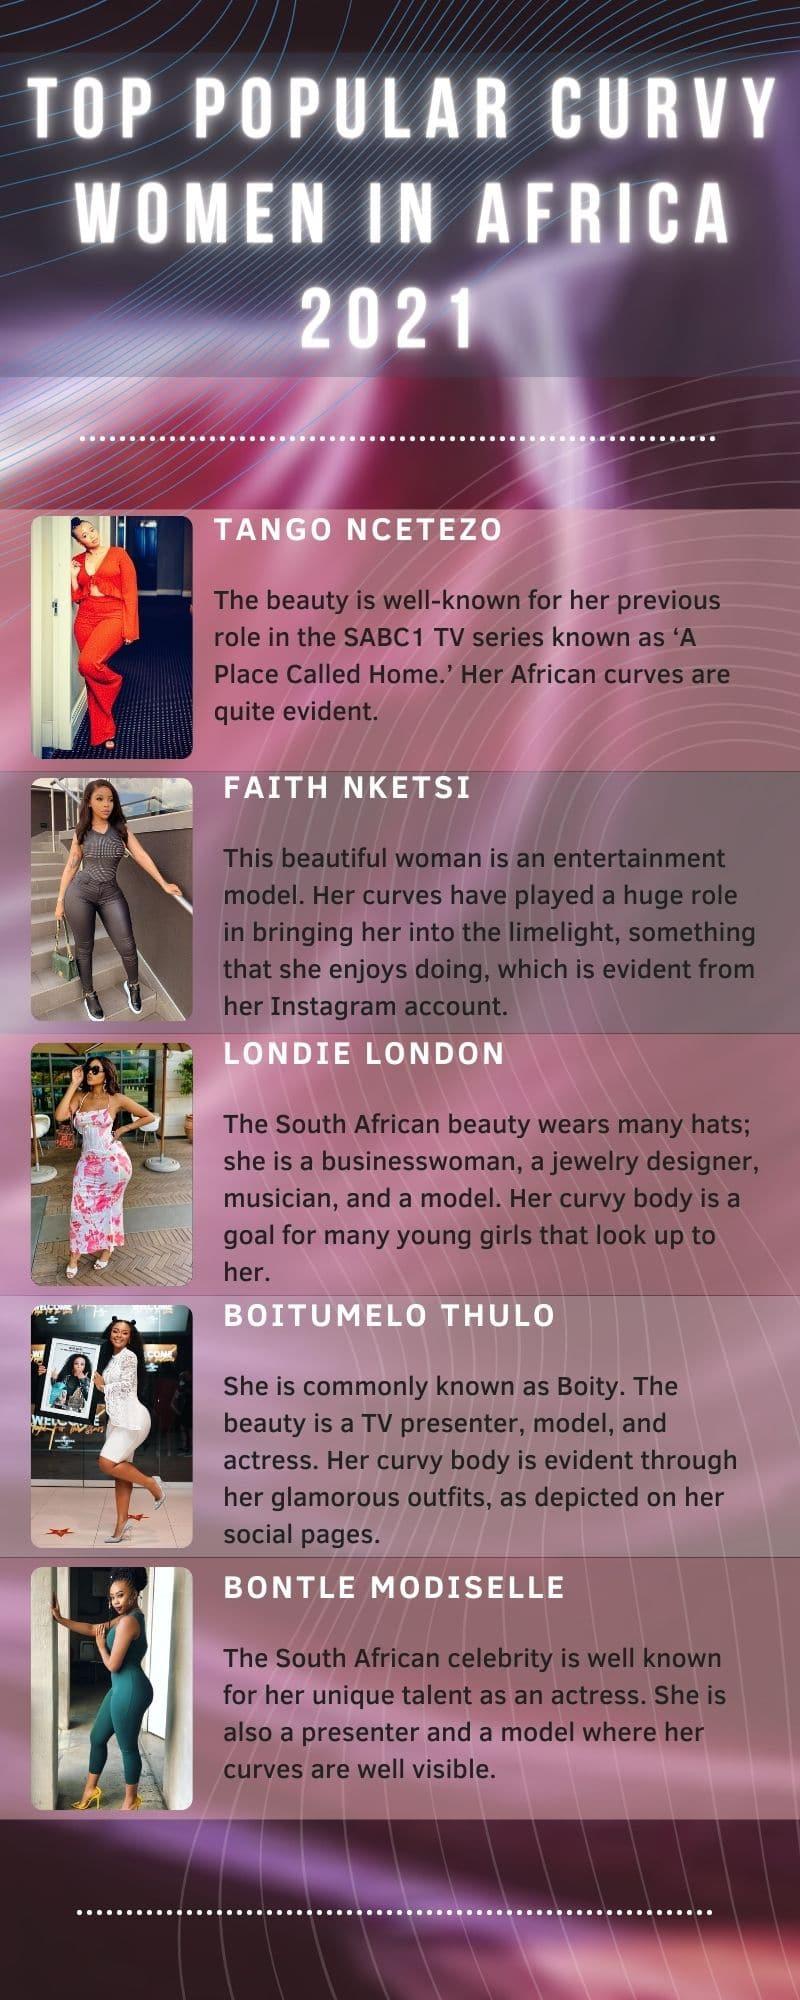 popular curvy women in Africa